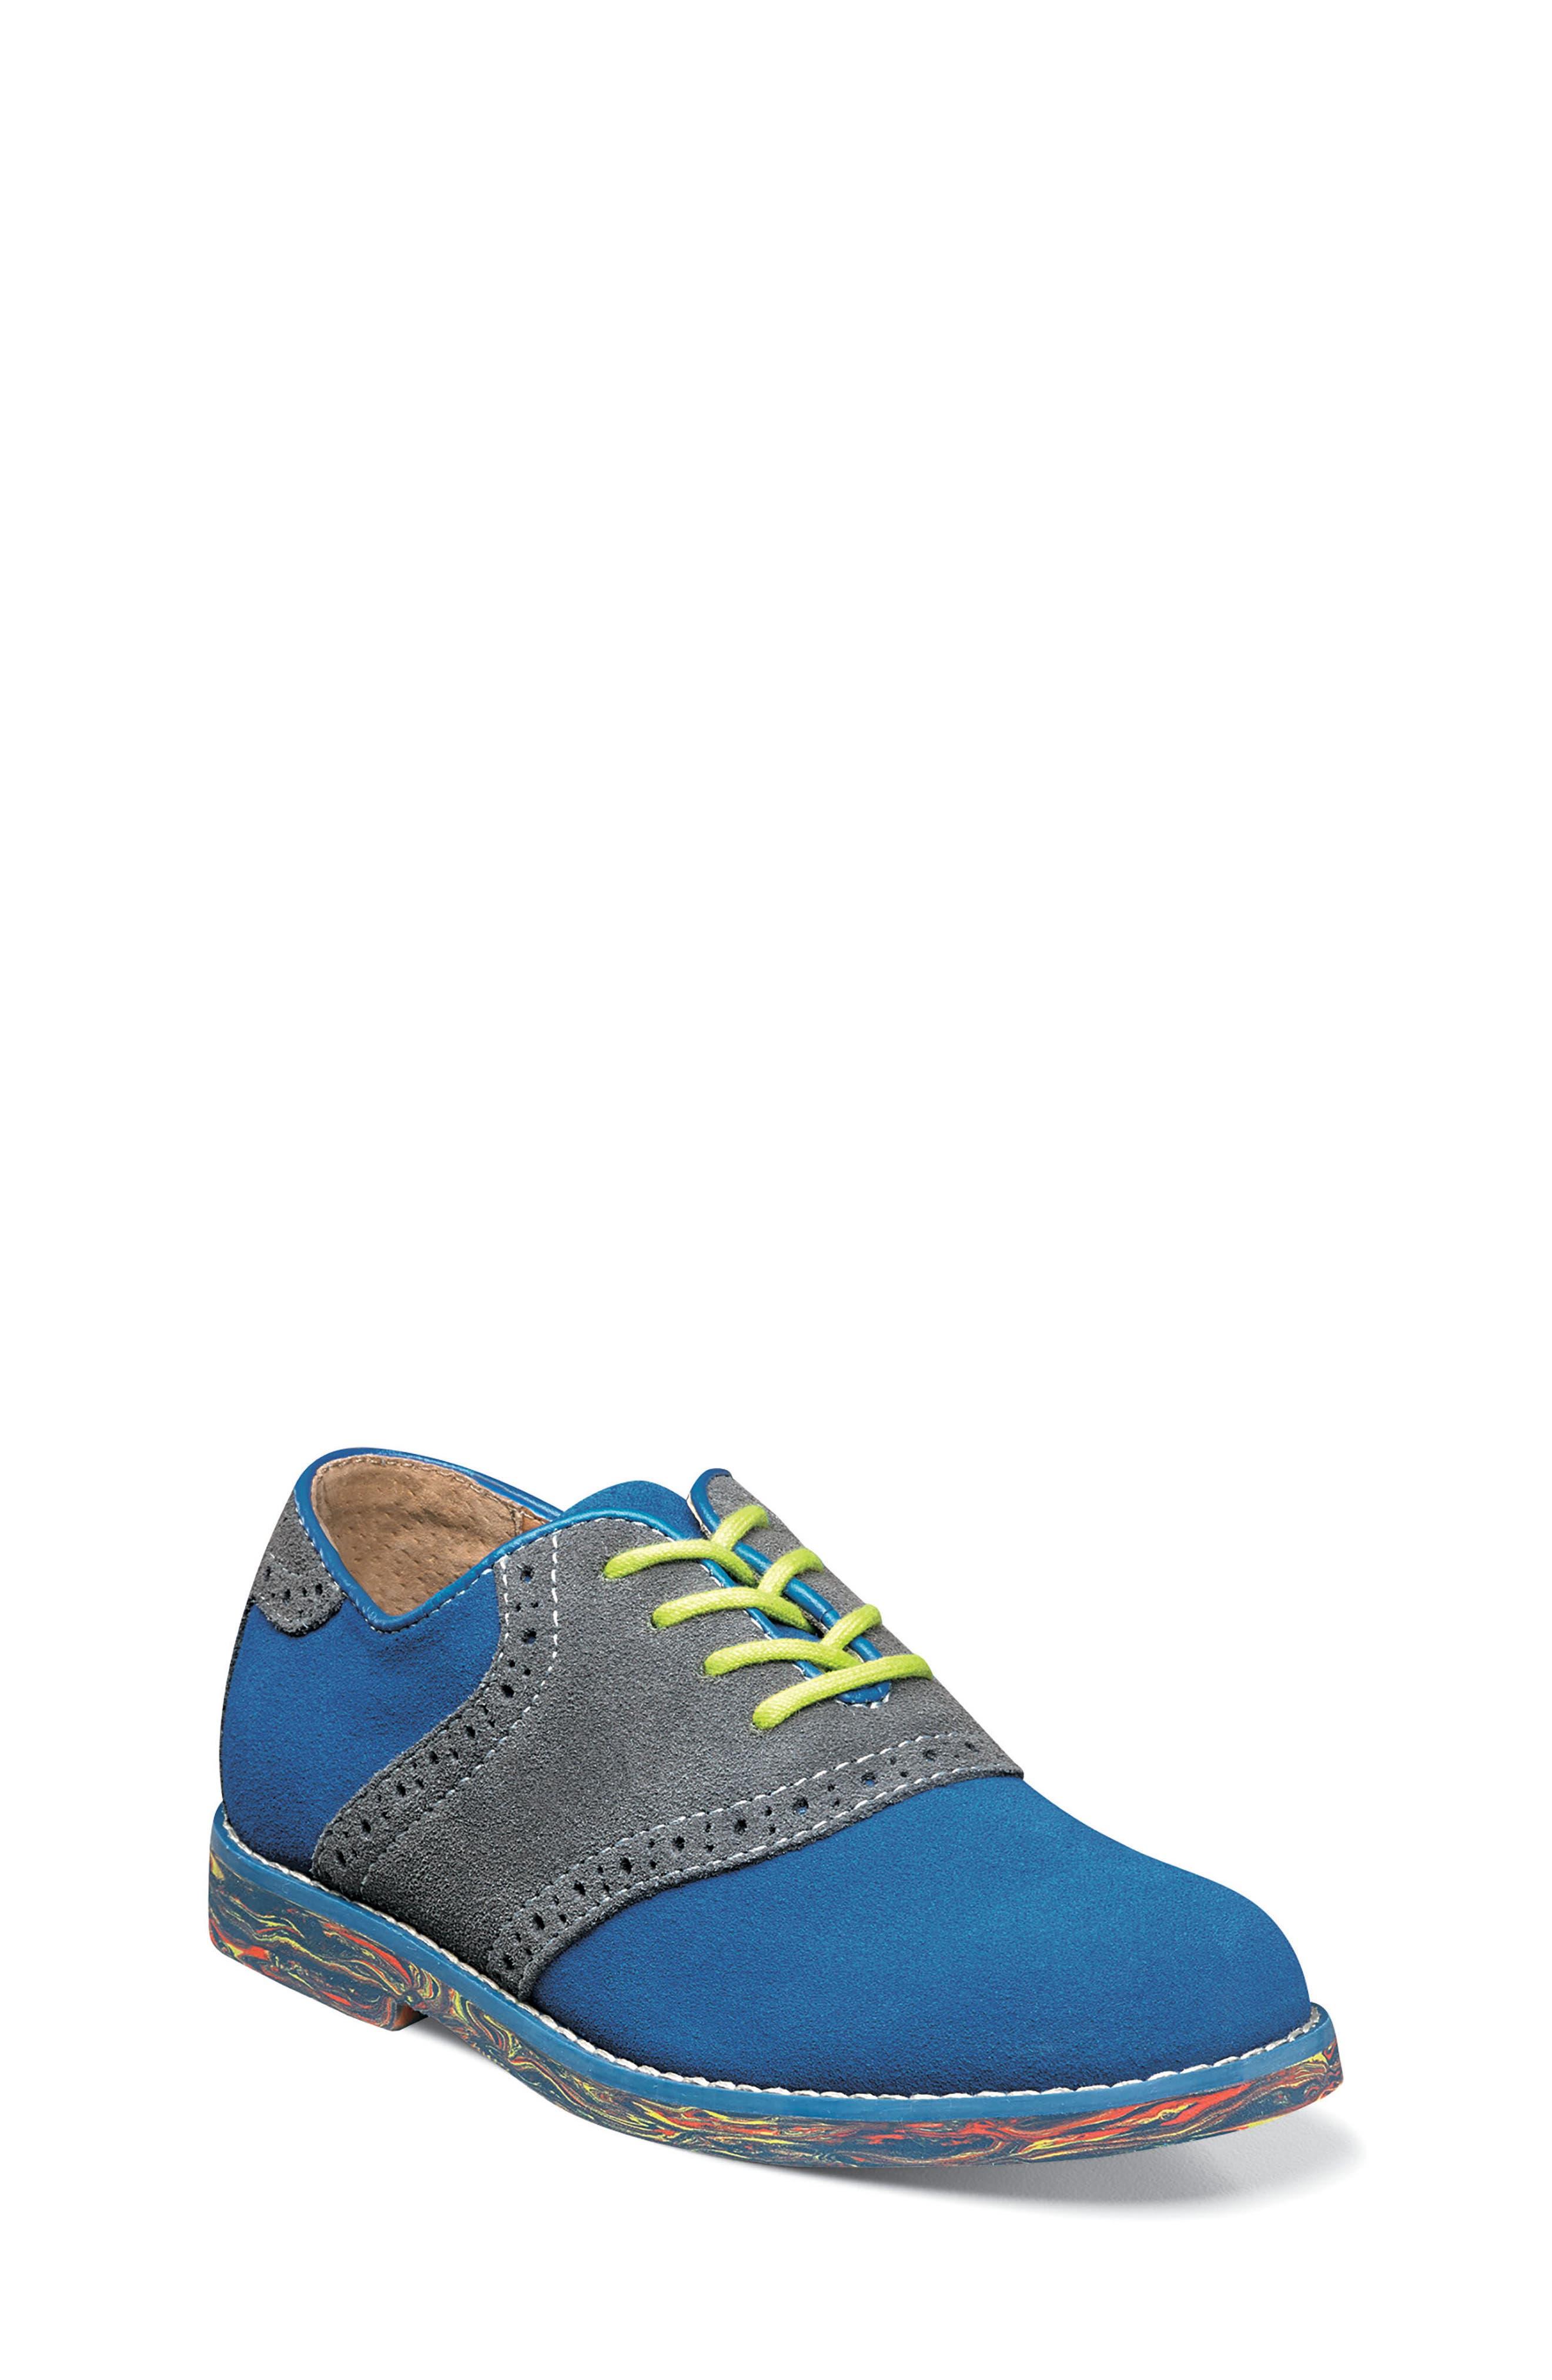 Florsheim 'Kennett Jr. II' Saddle Shoe (Toddler, Little Kid & Big Kid)